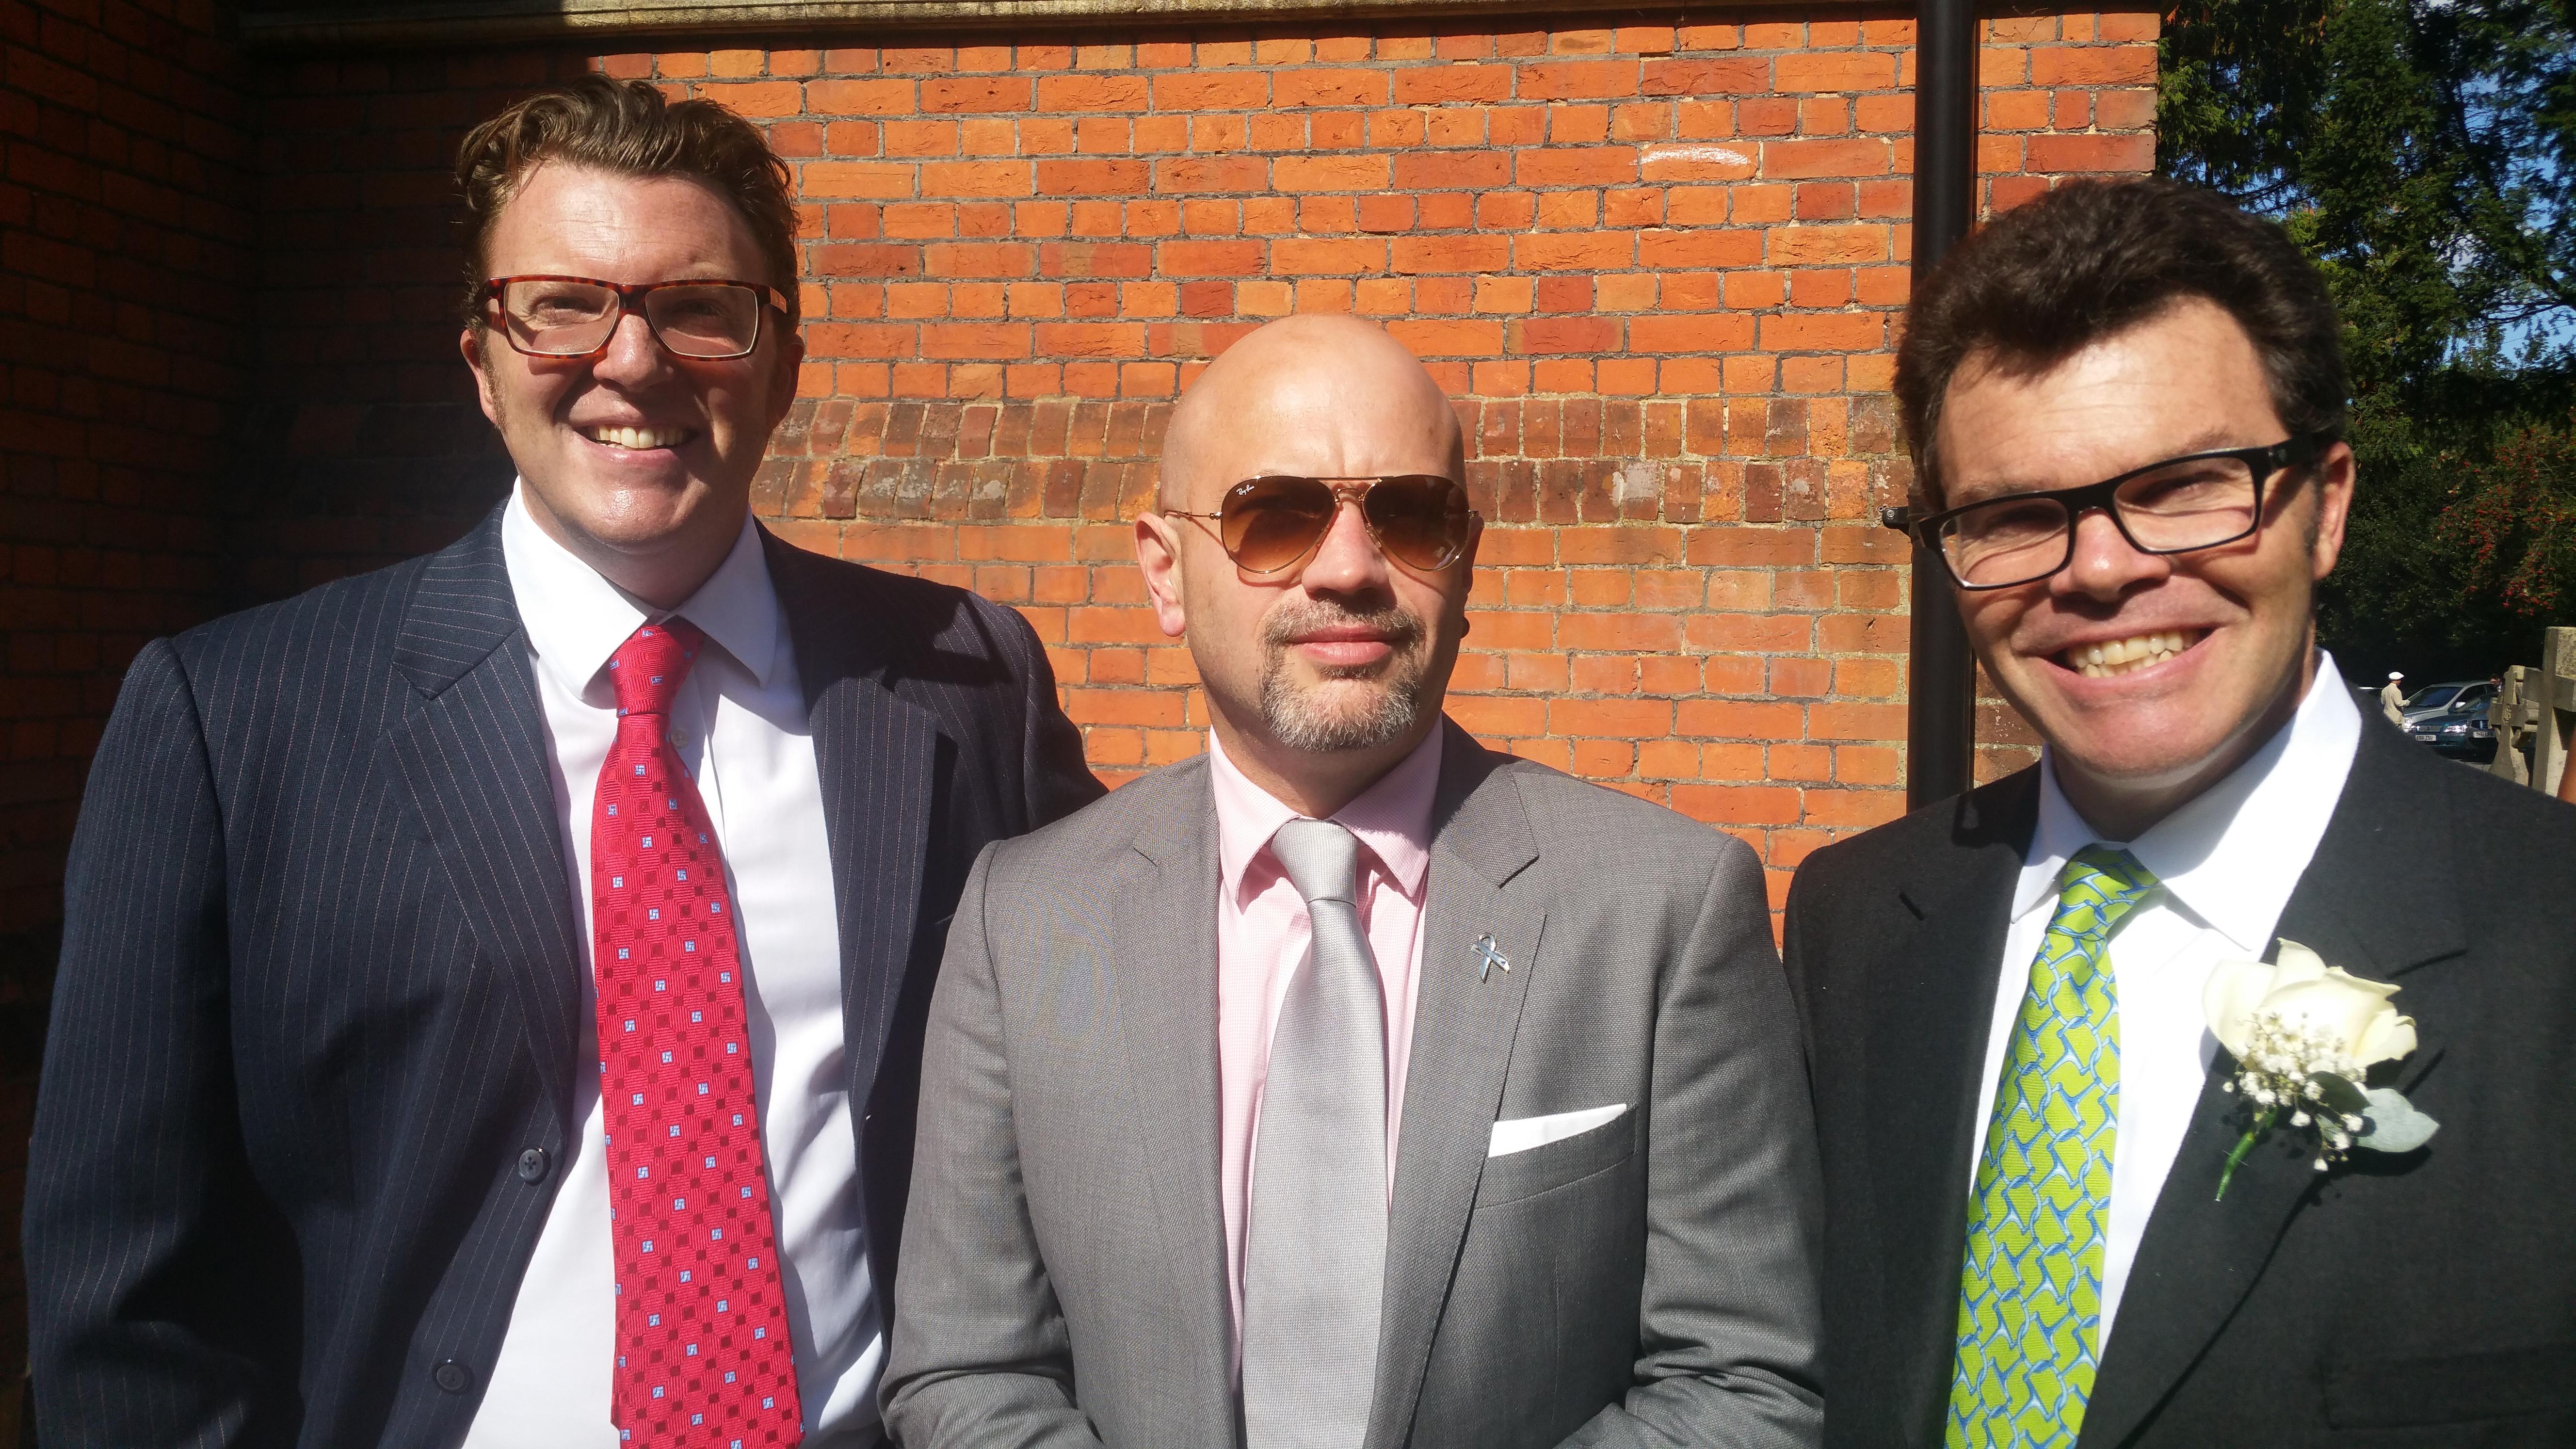 Ian, Russ and I at Ed & Rumbie's wedding